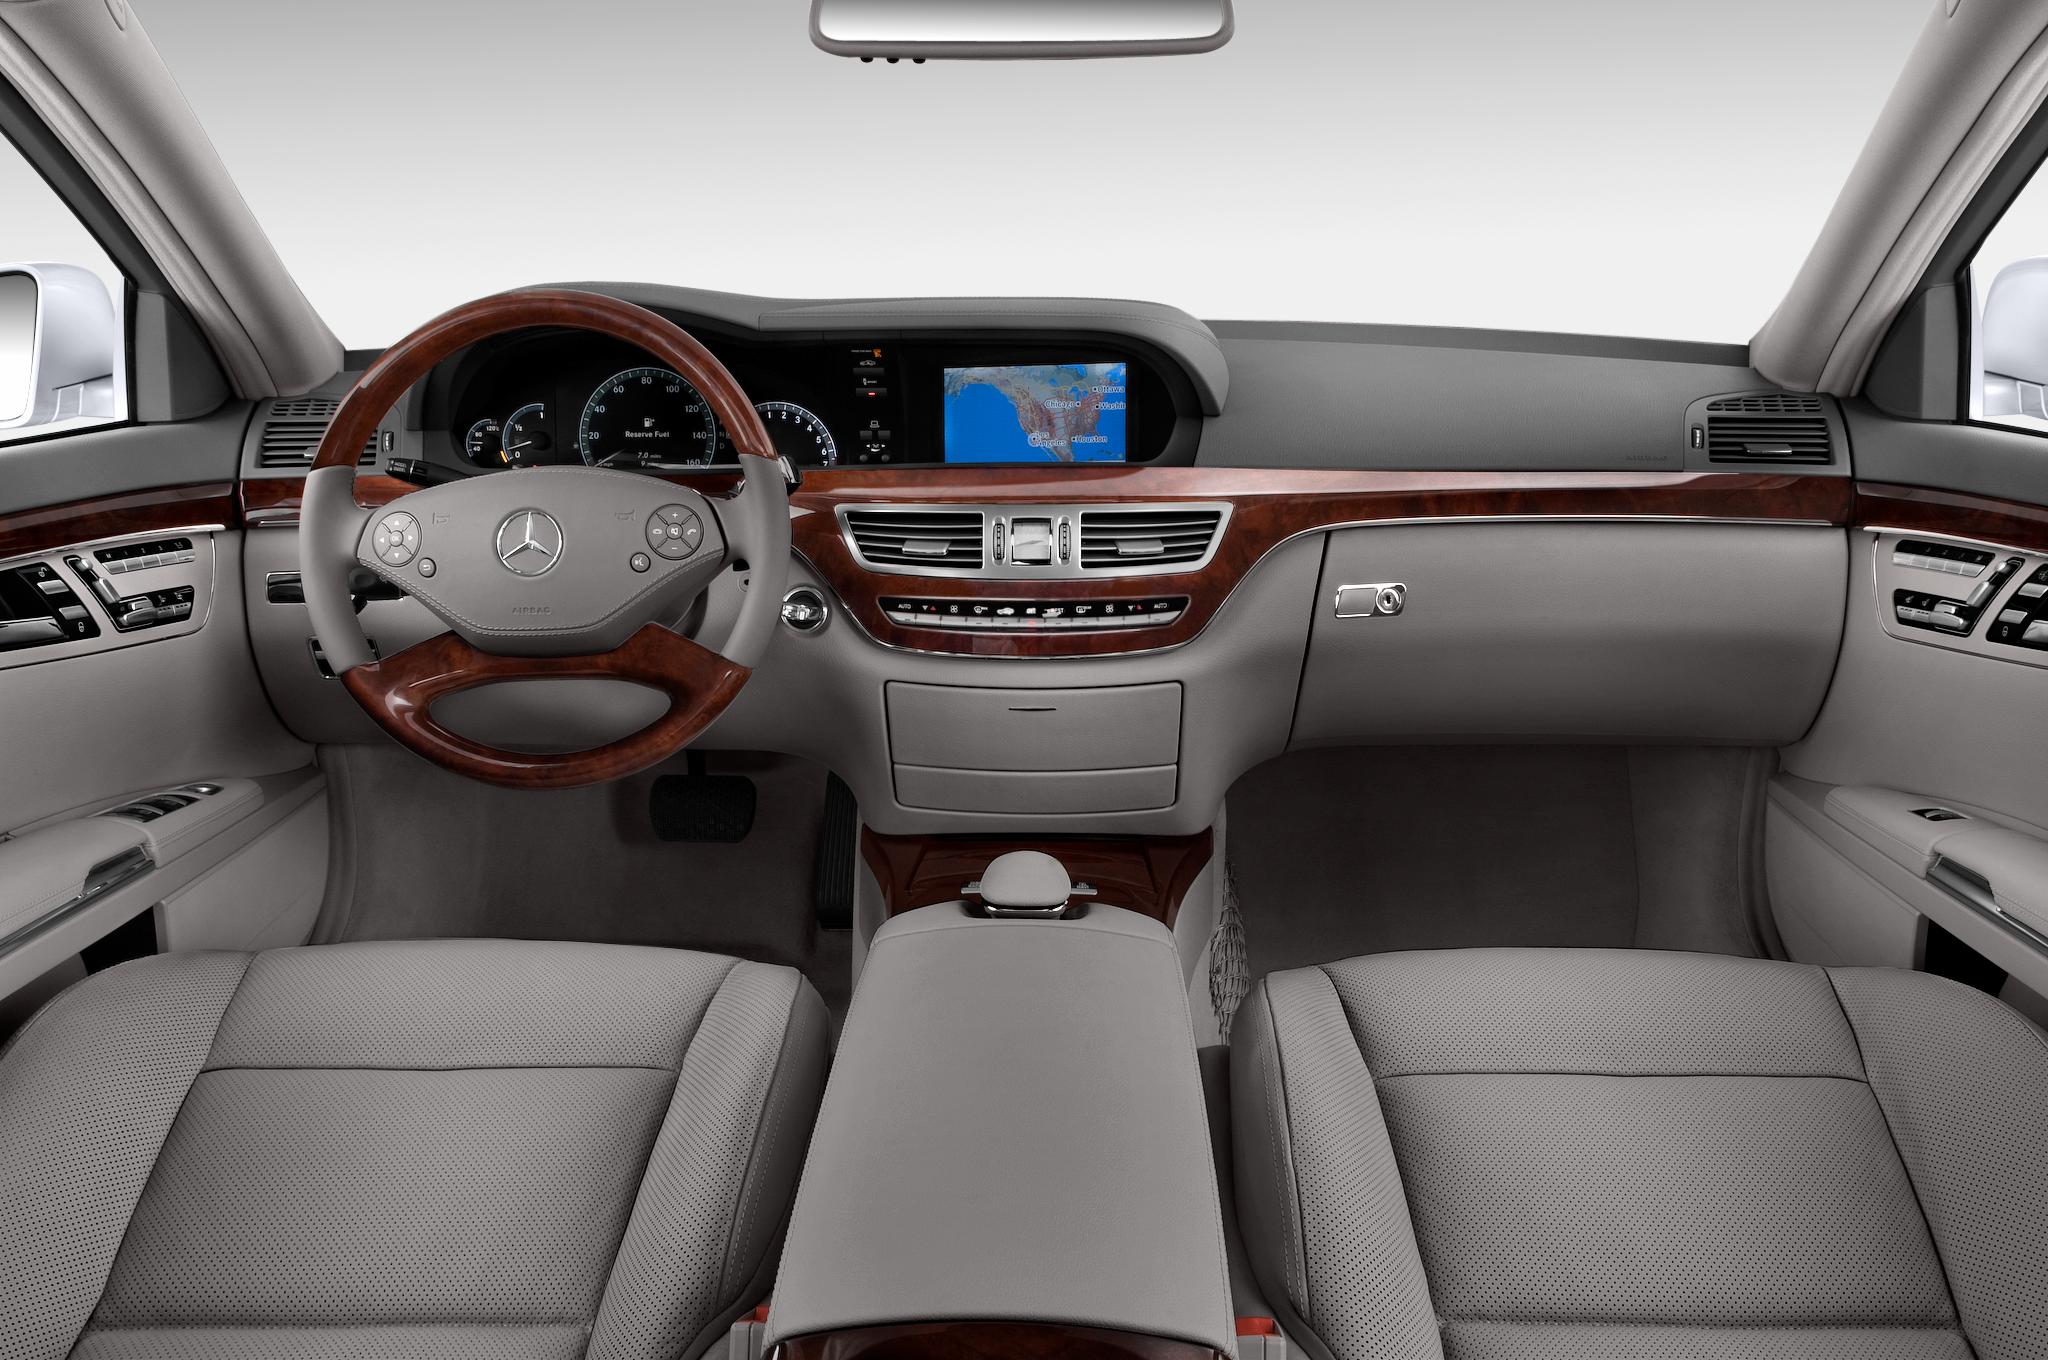 2010 mercedes benz s400 bluehybrid 2008 paris motor show coverage hybrid cars concept cars. Black Bedroom Furniture Sets. Home Design Ideas